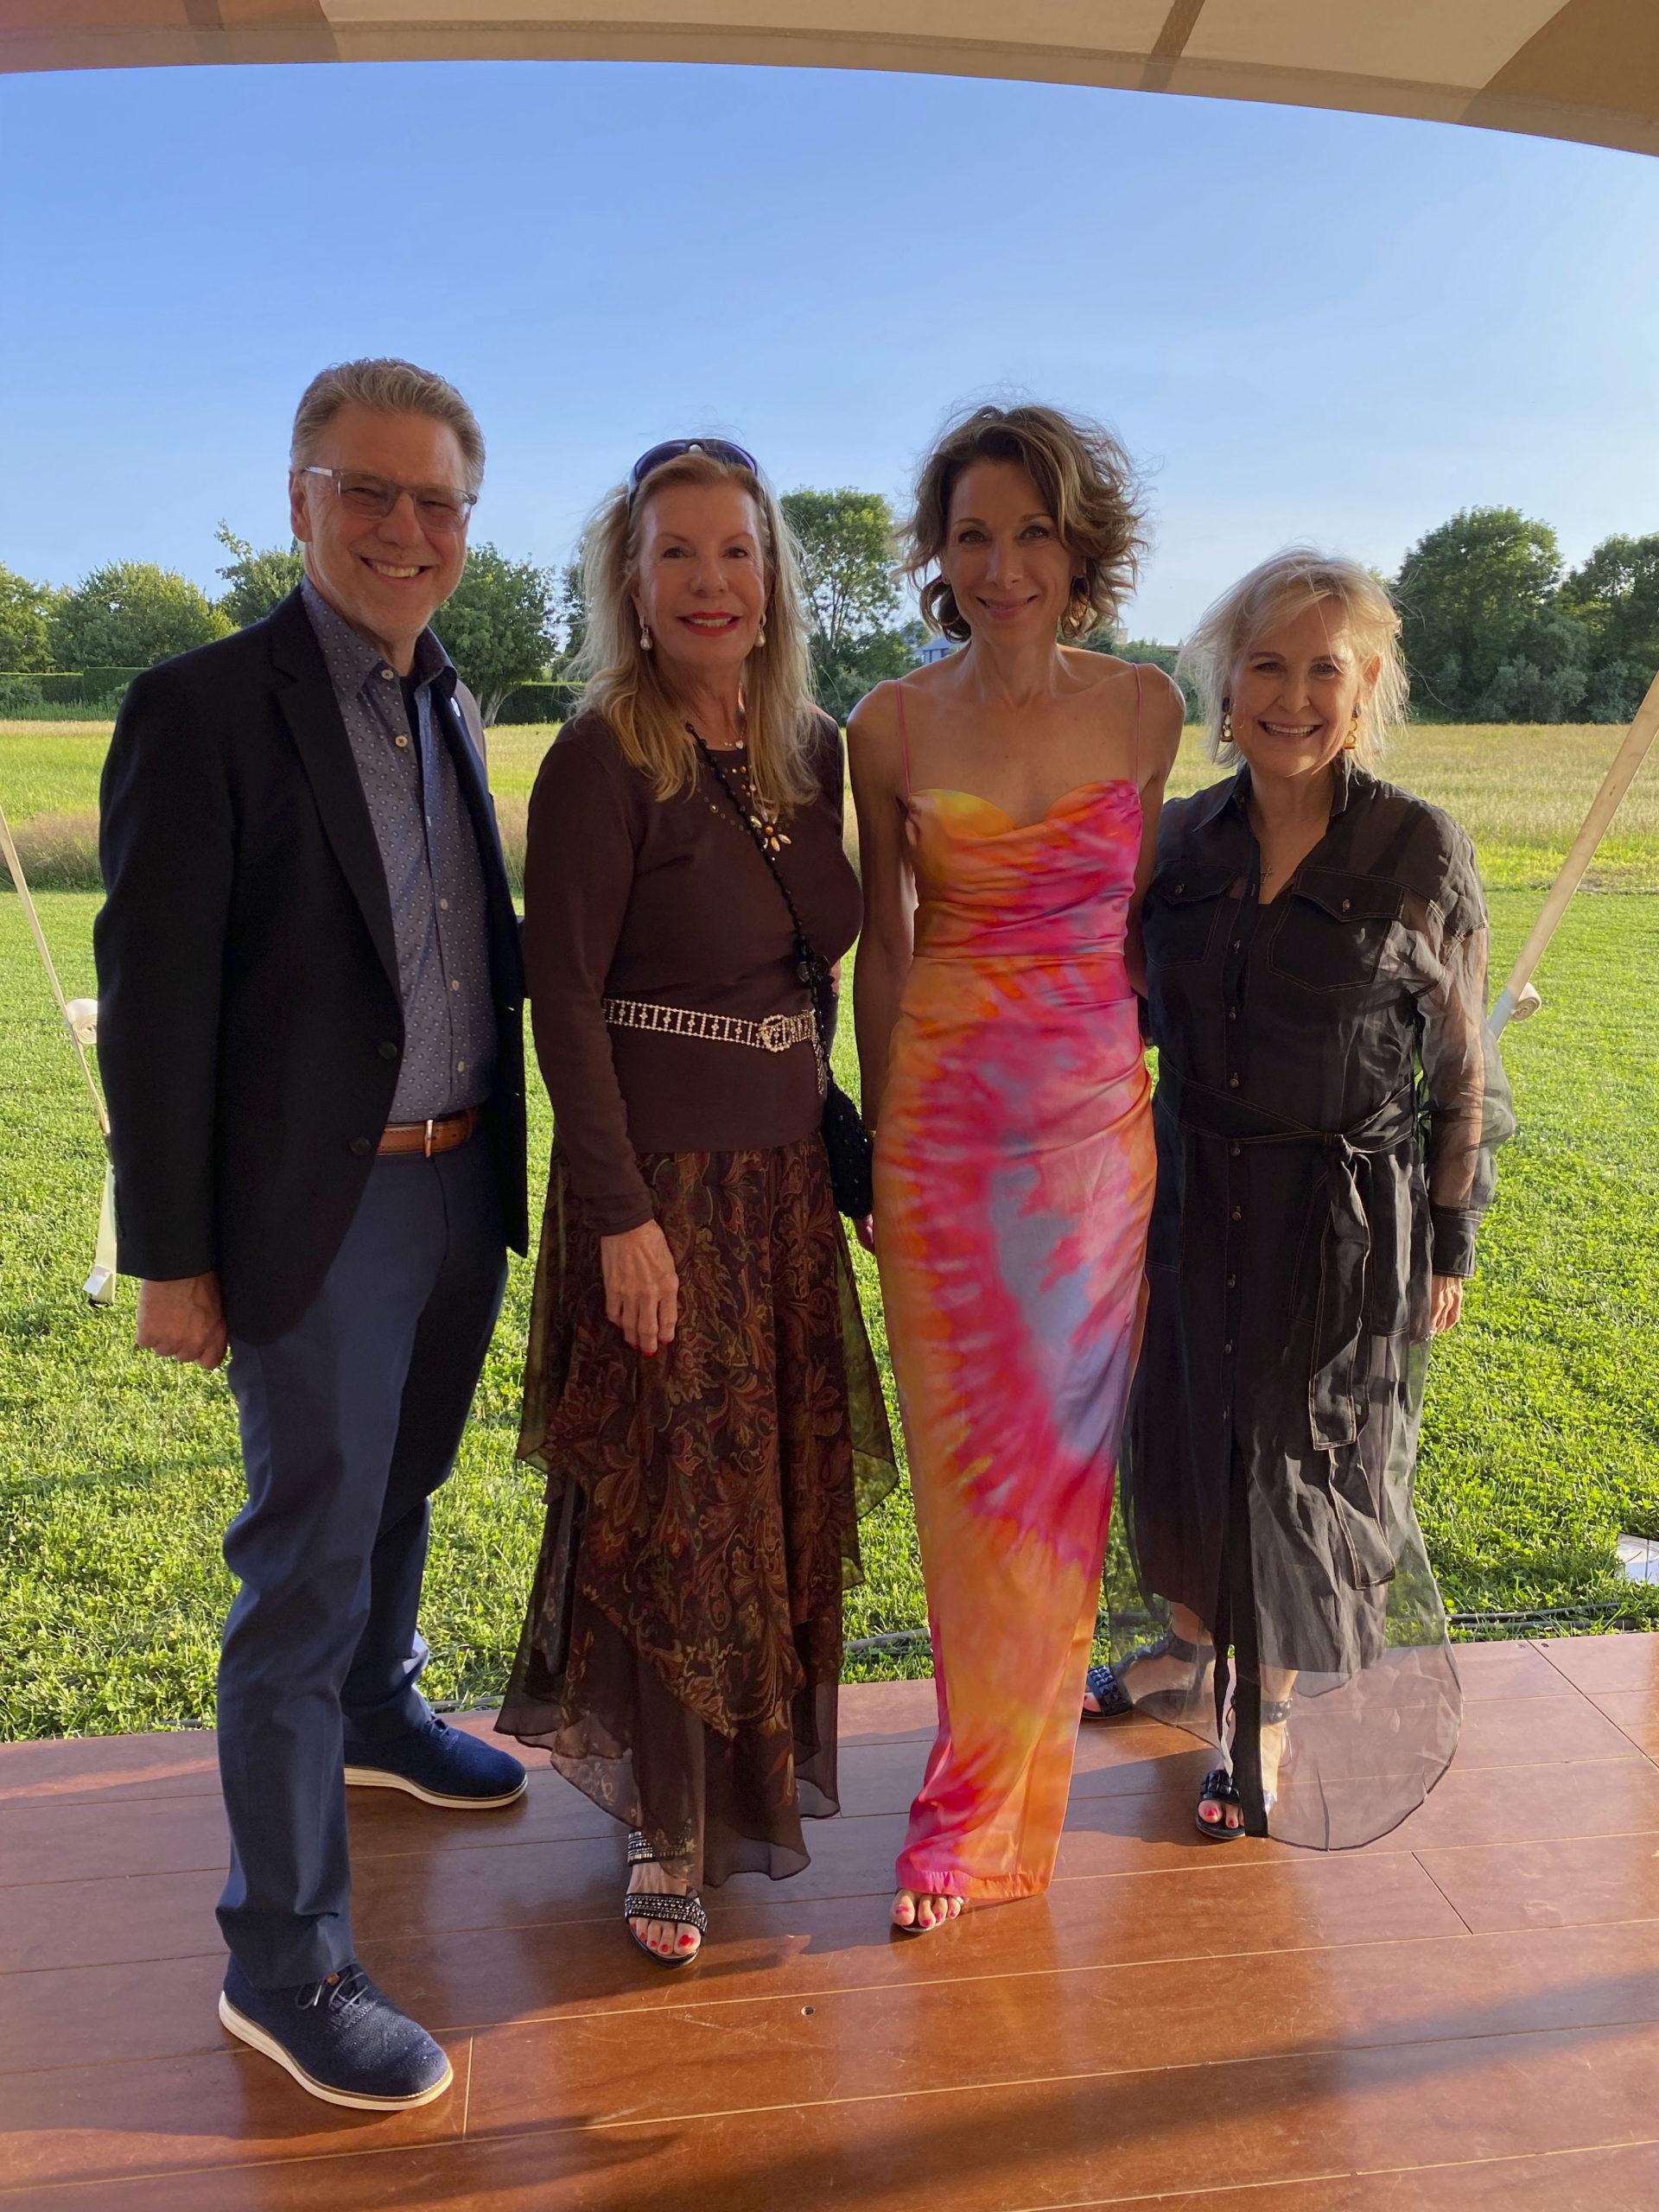 Harry Johns, Princess Yasmin Aga Khan, Daryl Simon and Nicole Sexton at the Fork It Alzheimer event.  GREG DELIA